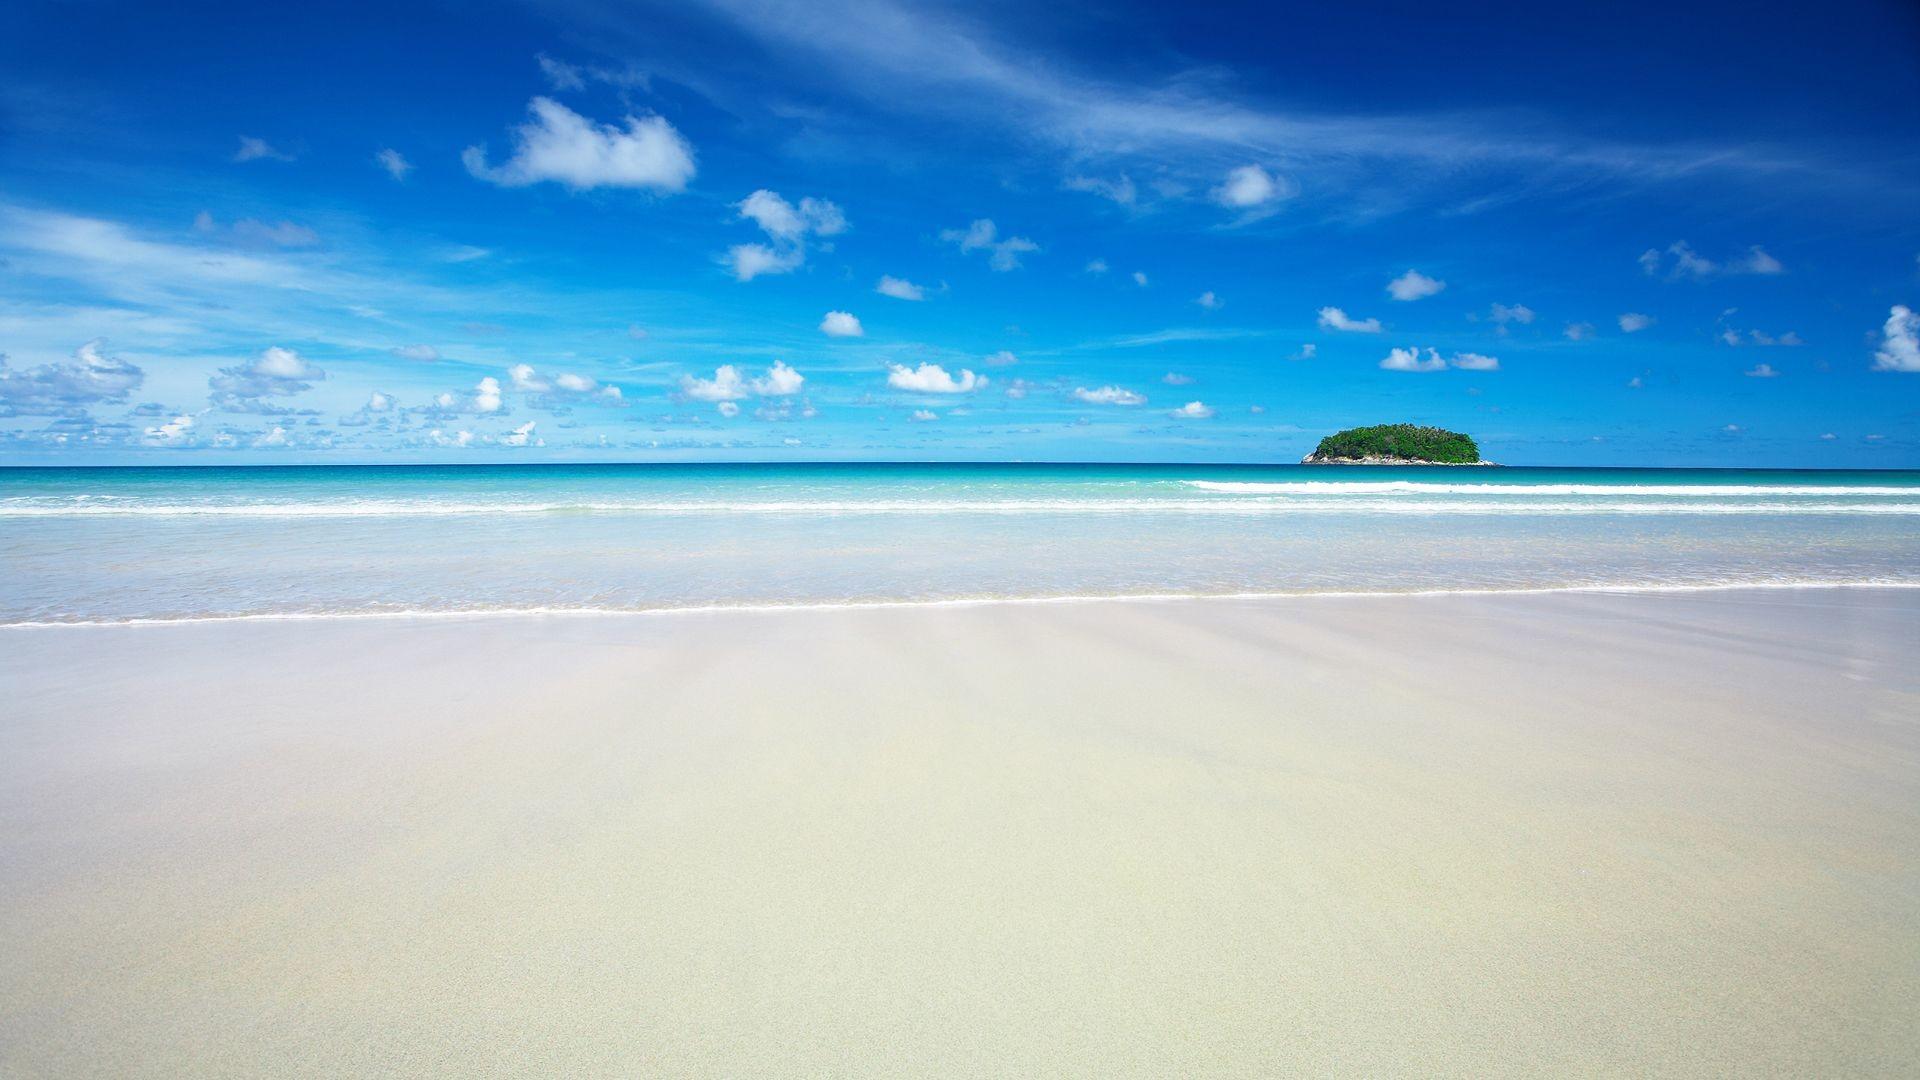 HD Sky Blue Beach